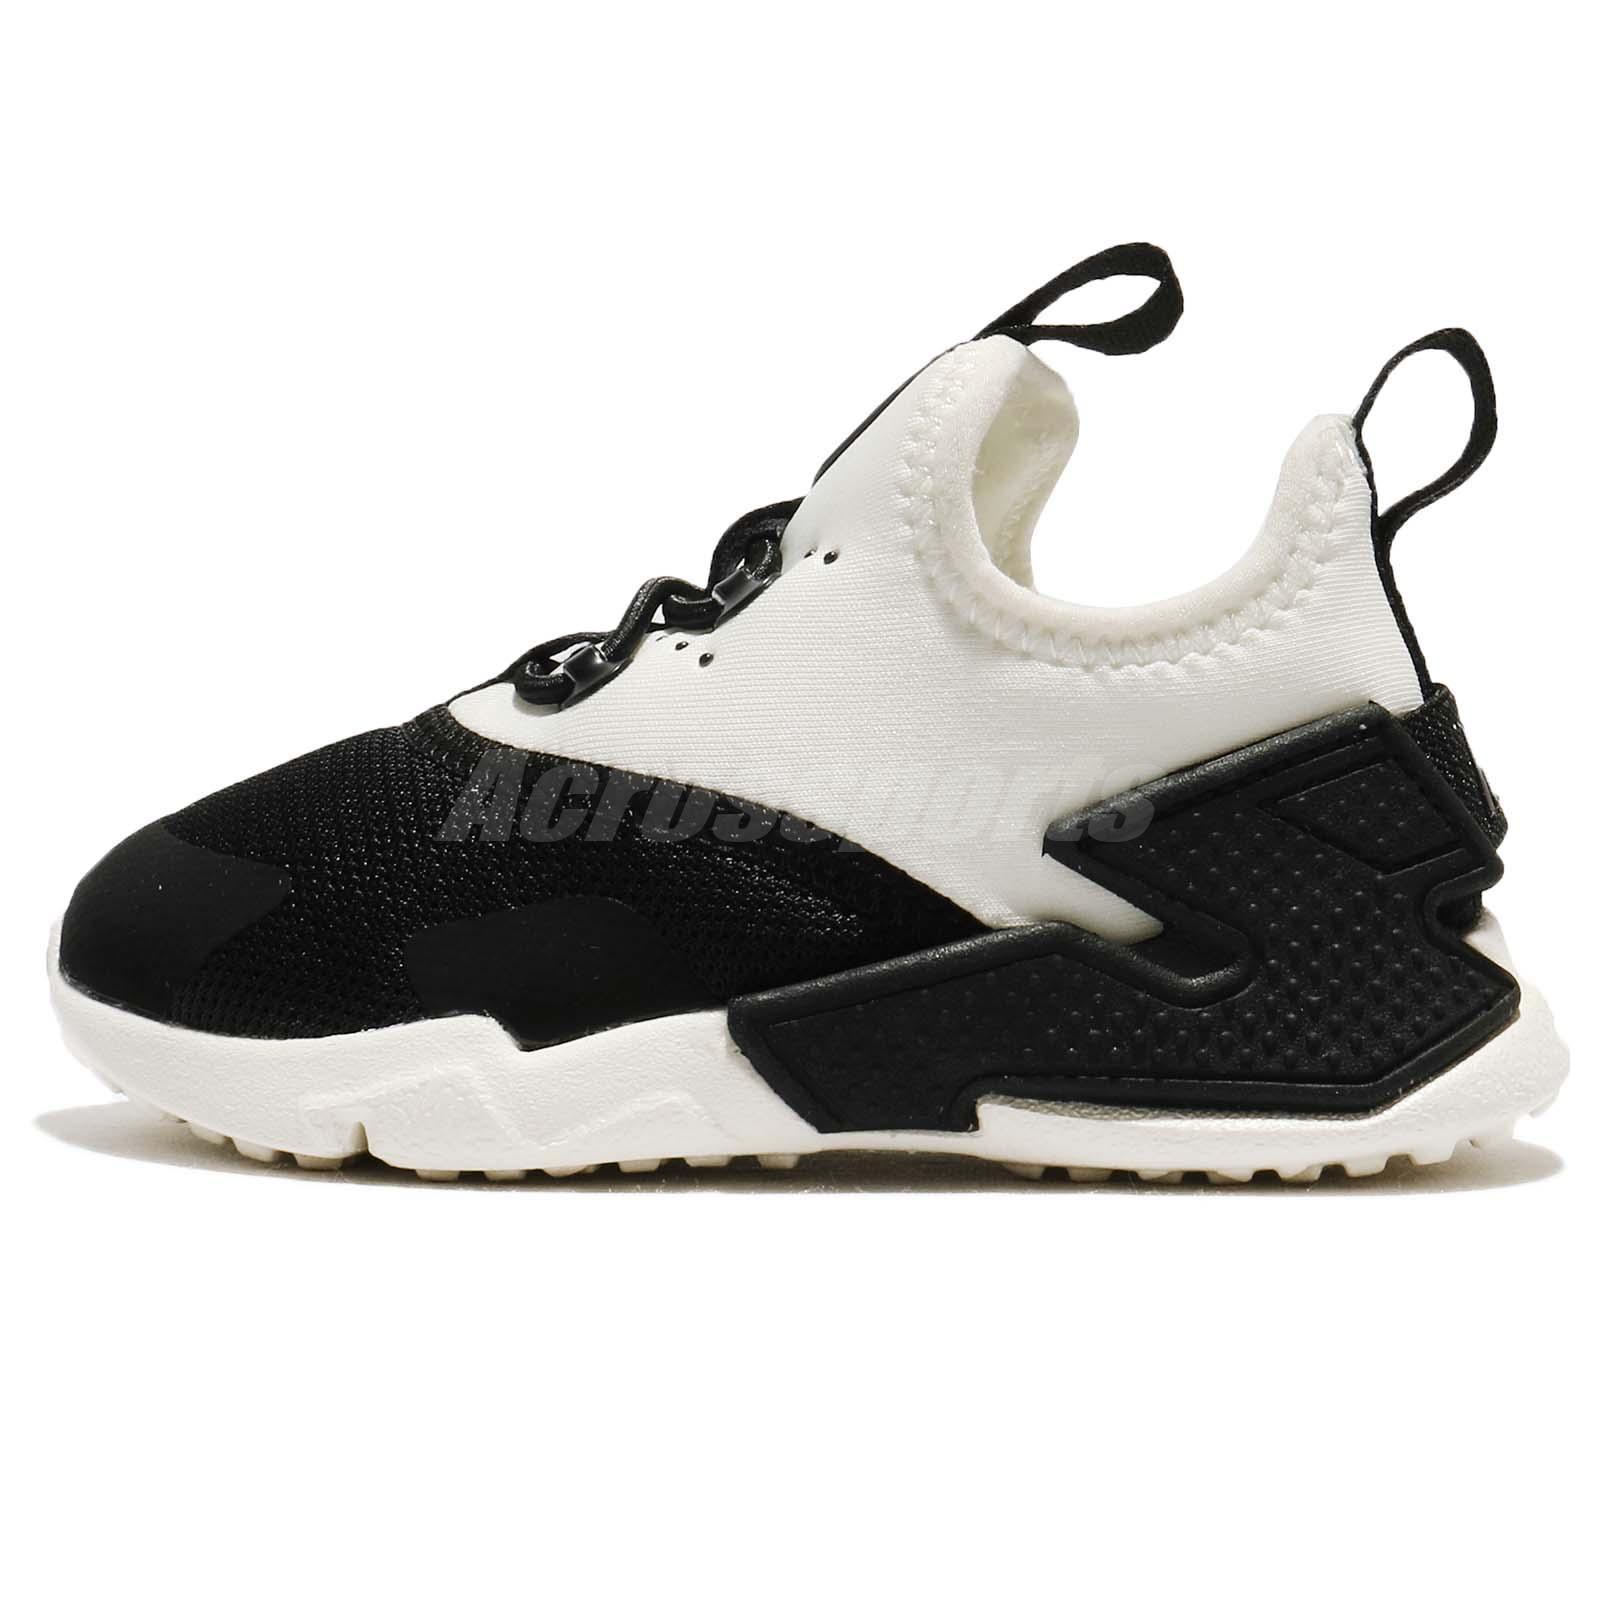 Nike Huarache Drift TDE Black Sail White Toddler Infant Baby Shoes